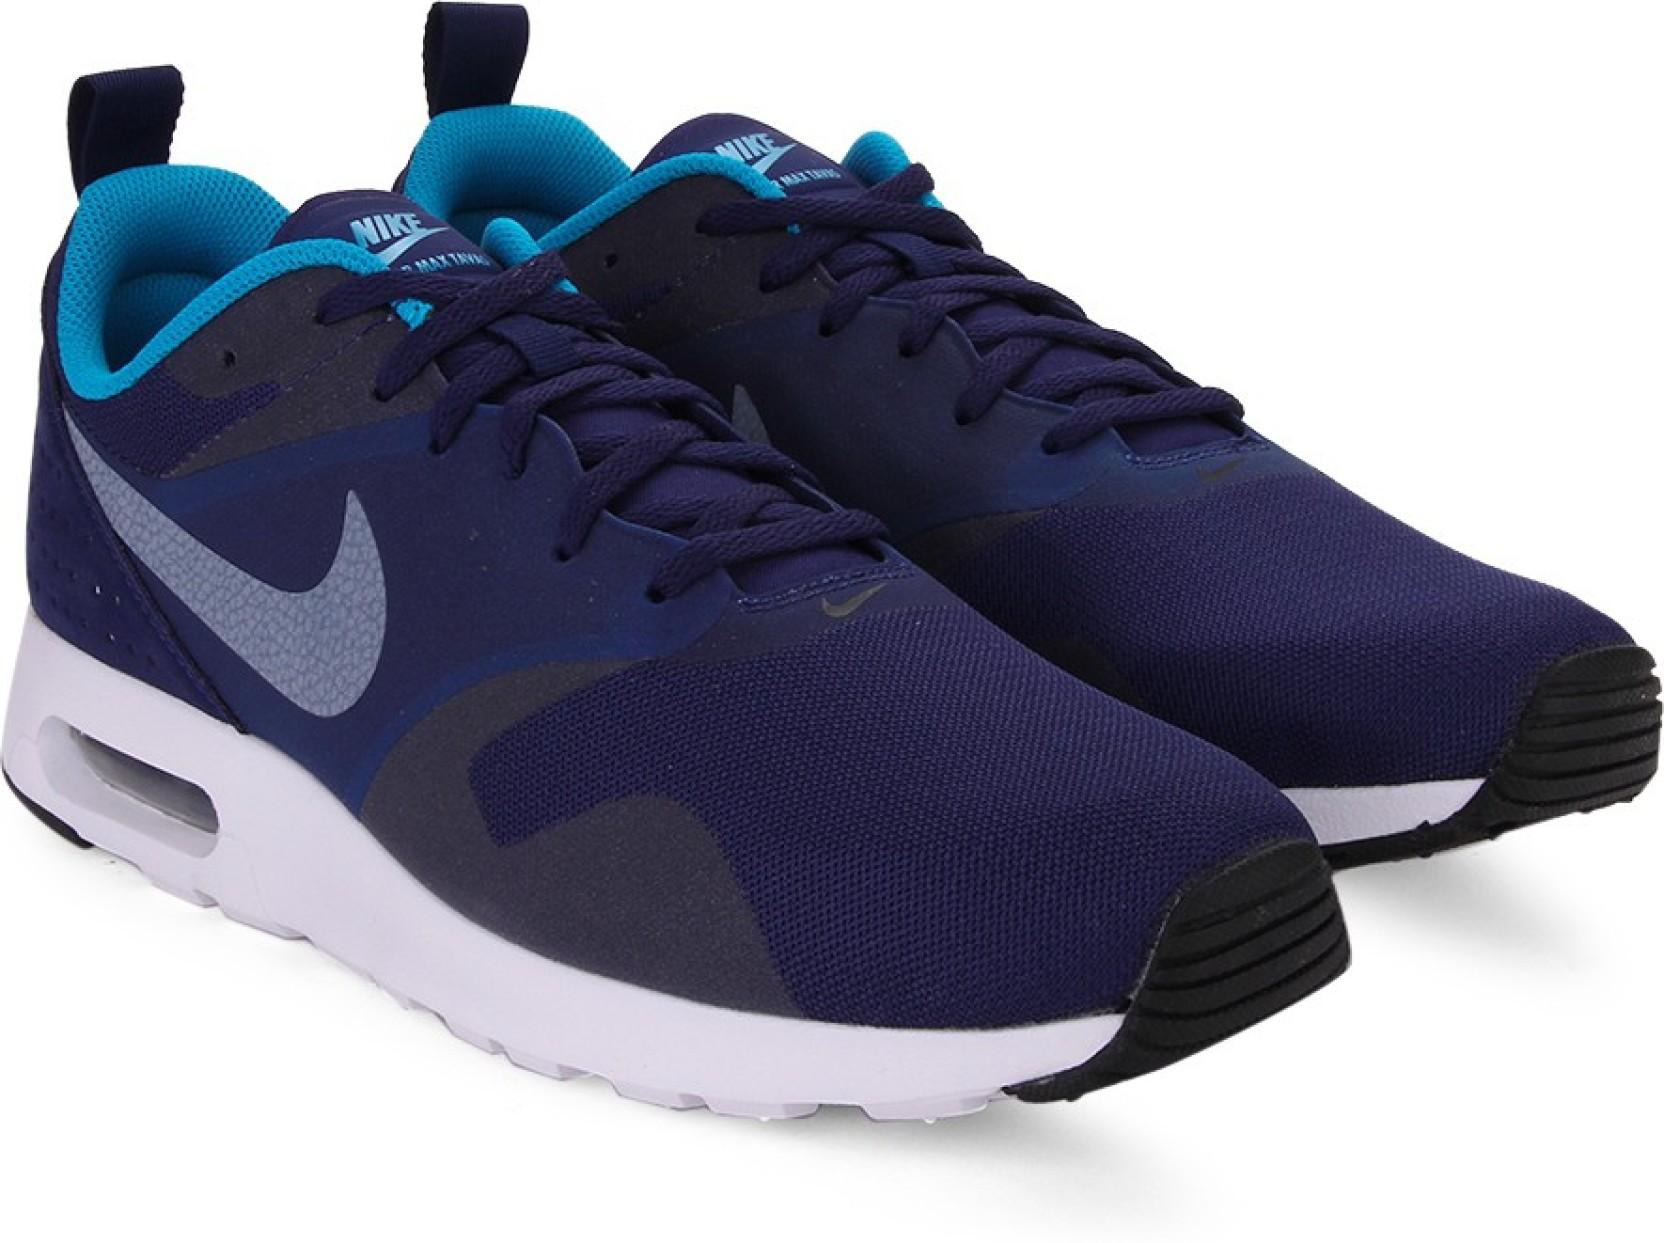 110c5fc3e9f1 ... coupon code for nike air max tavas running shoes for men blue black  c73ed e72fc